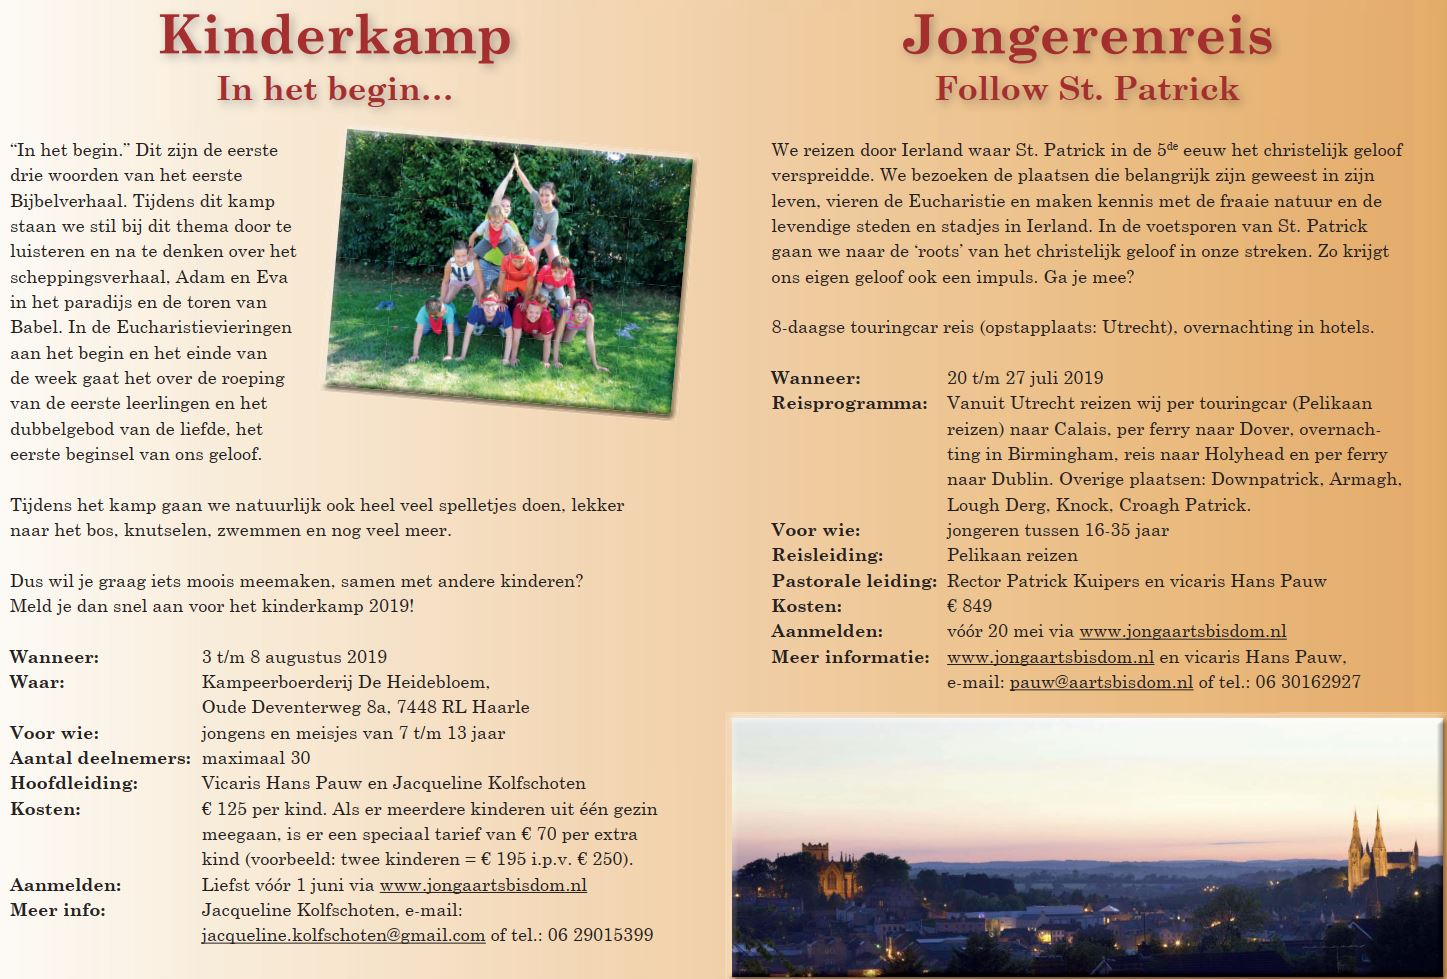 Kinderkamp En Jongerenreis Zomer 2019 H Norbertusparochie